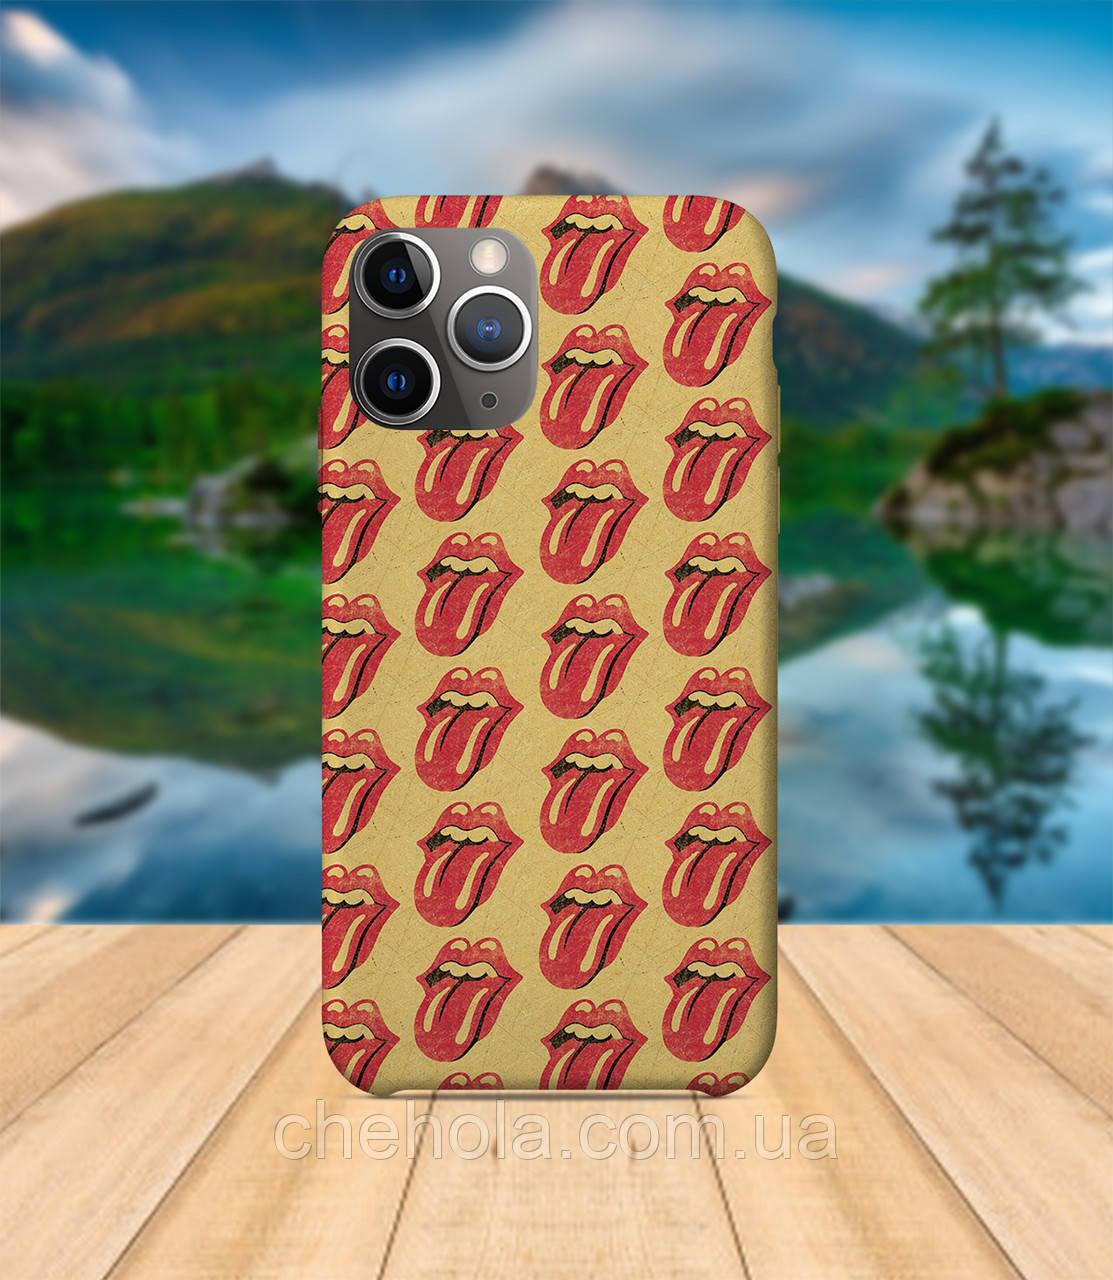 Чехол iPhone 11 PRO MAX Rolling Stones Губы с принтом